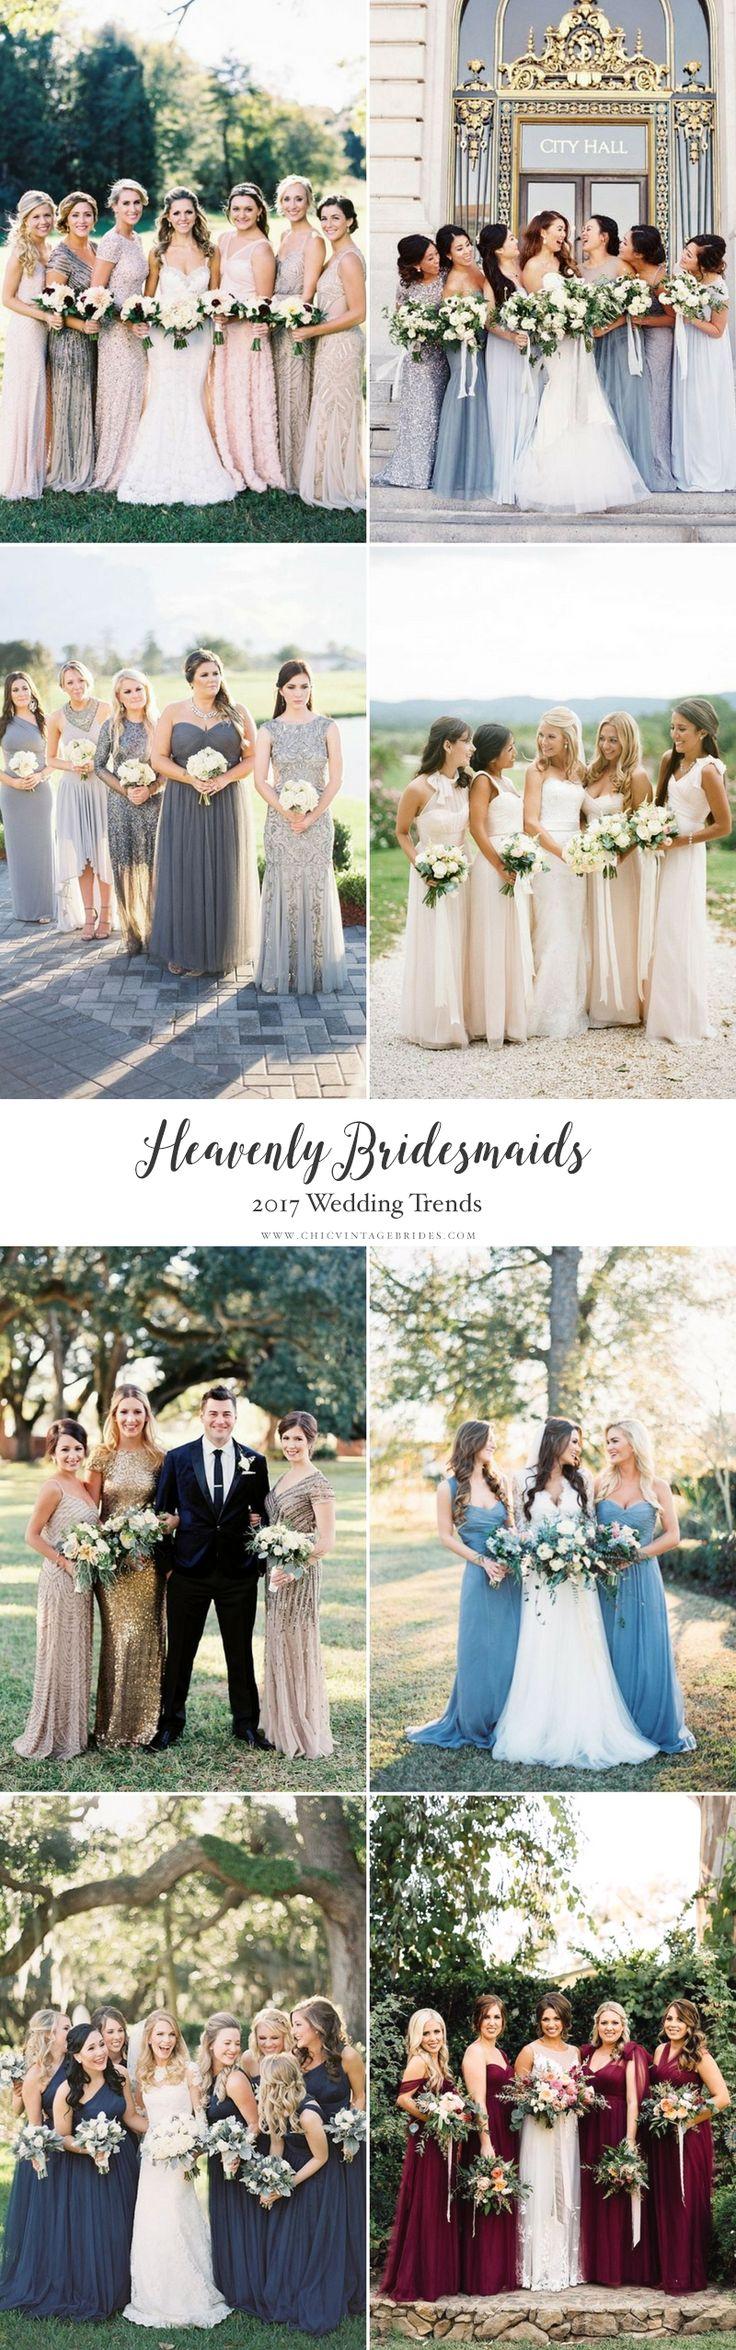 March Wedding Ideas 2017 - The Best Wedding 2018